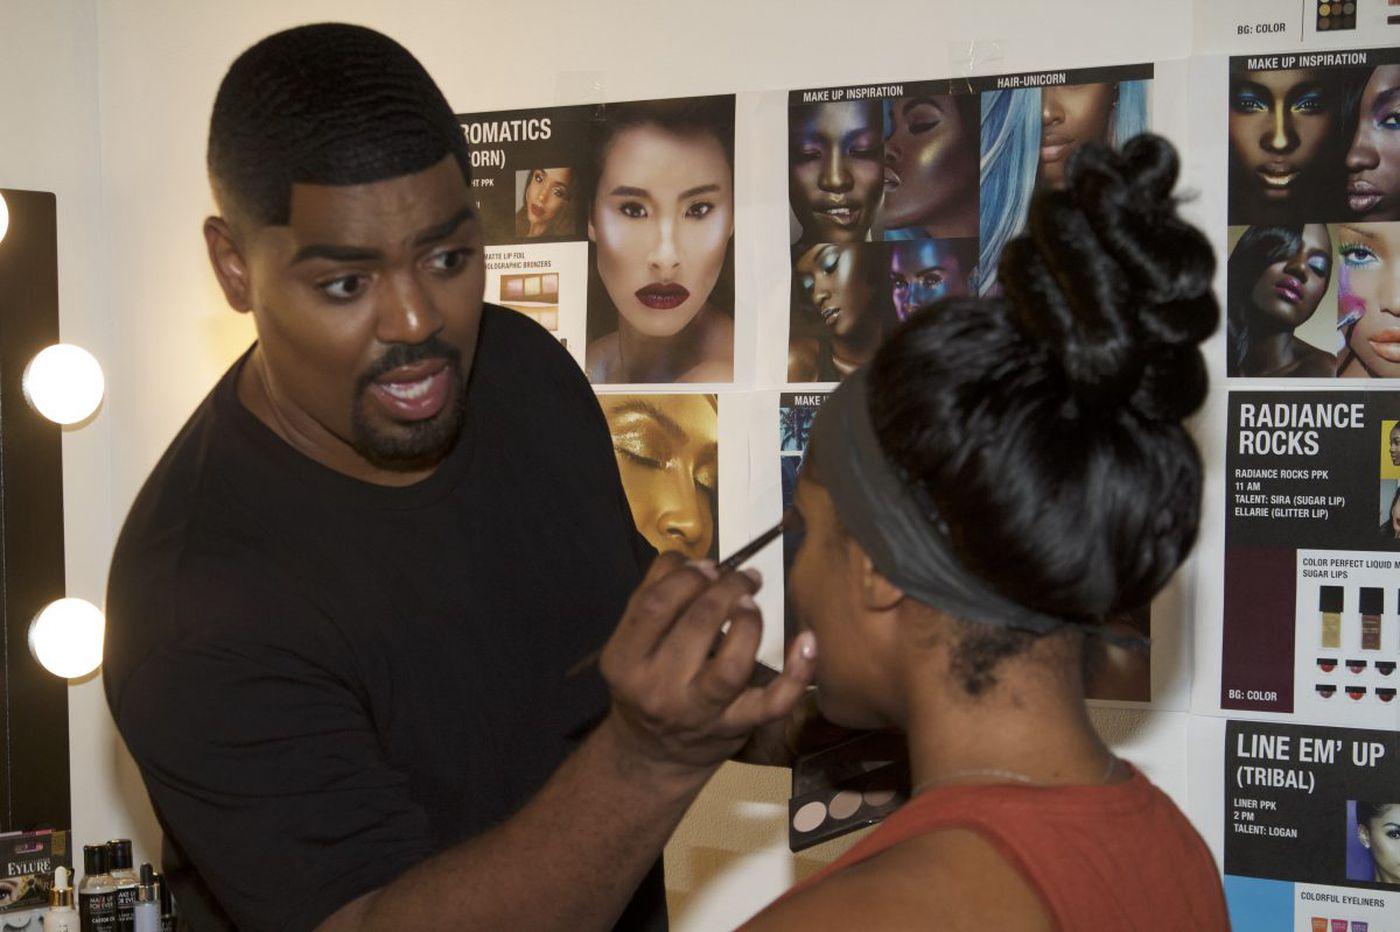 Meet the celebrity makeup artist who is helping Black Radiance stay relevant | Elizabeth Wellington